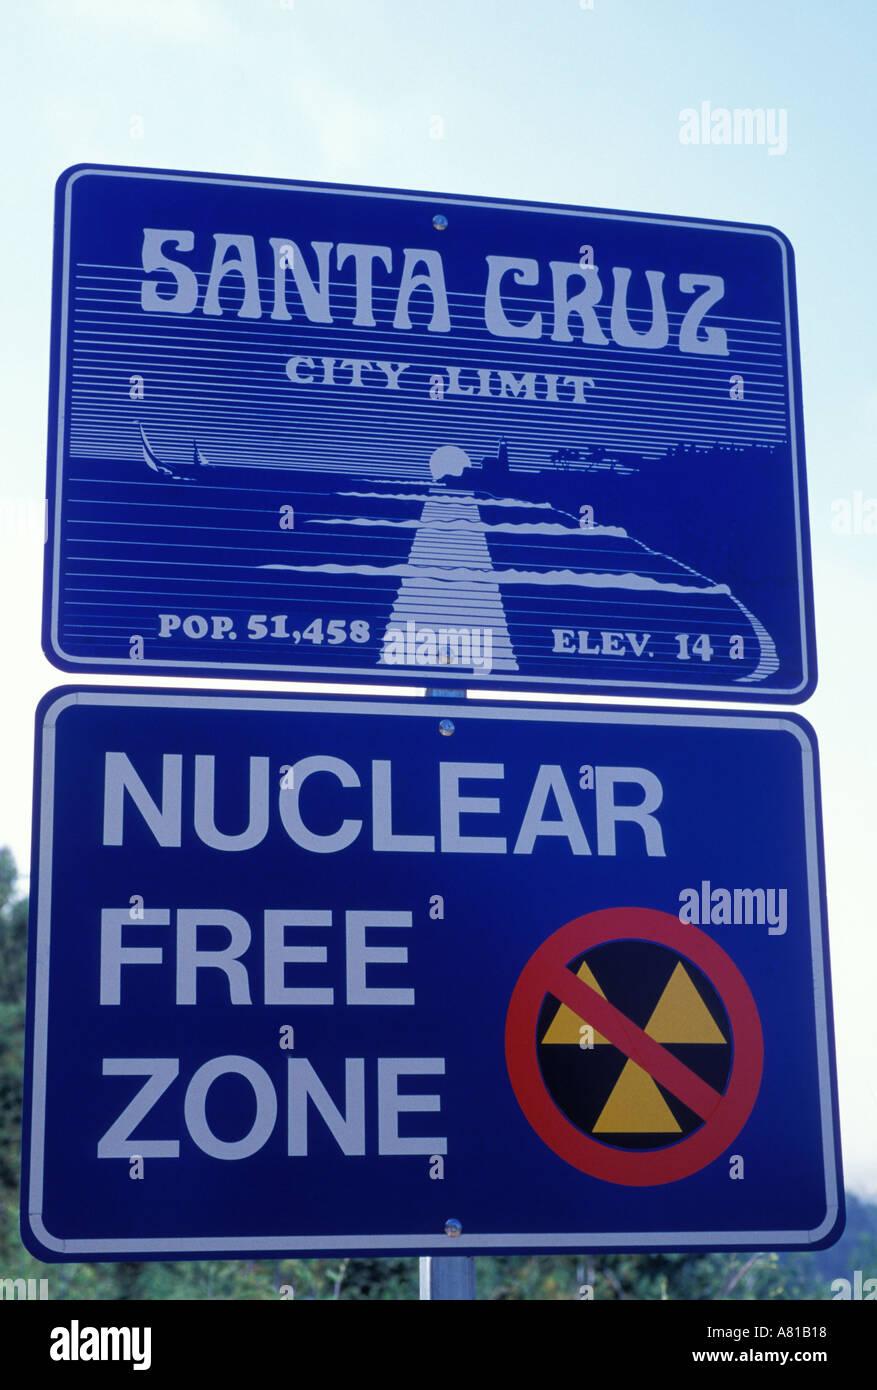 California Santa Cruz Nuclear Free Zone road sign - Stock Image